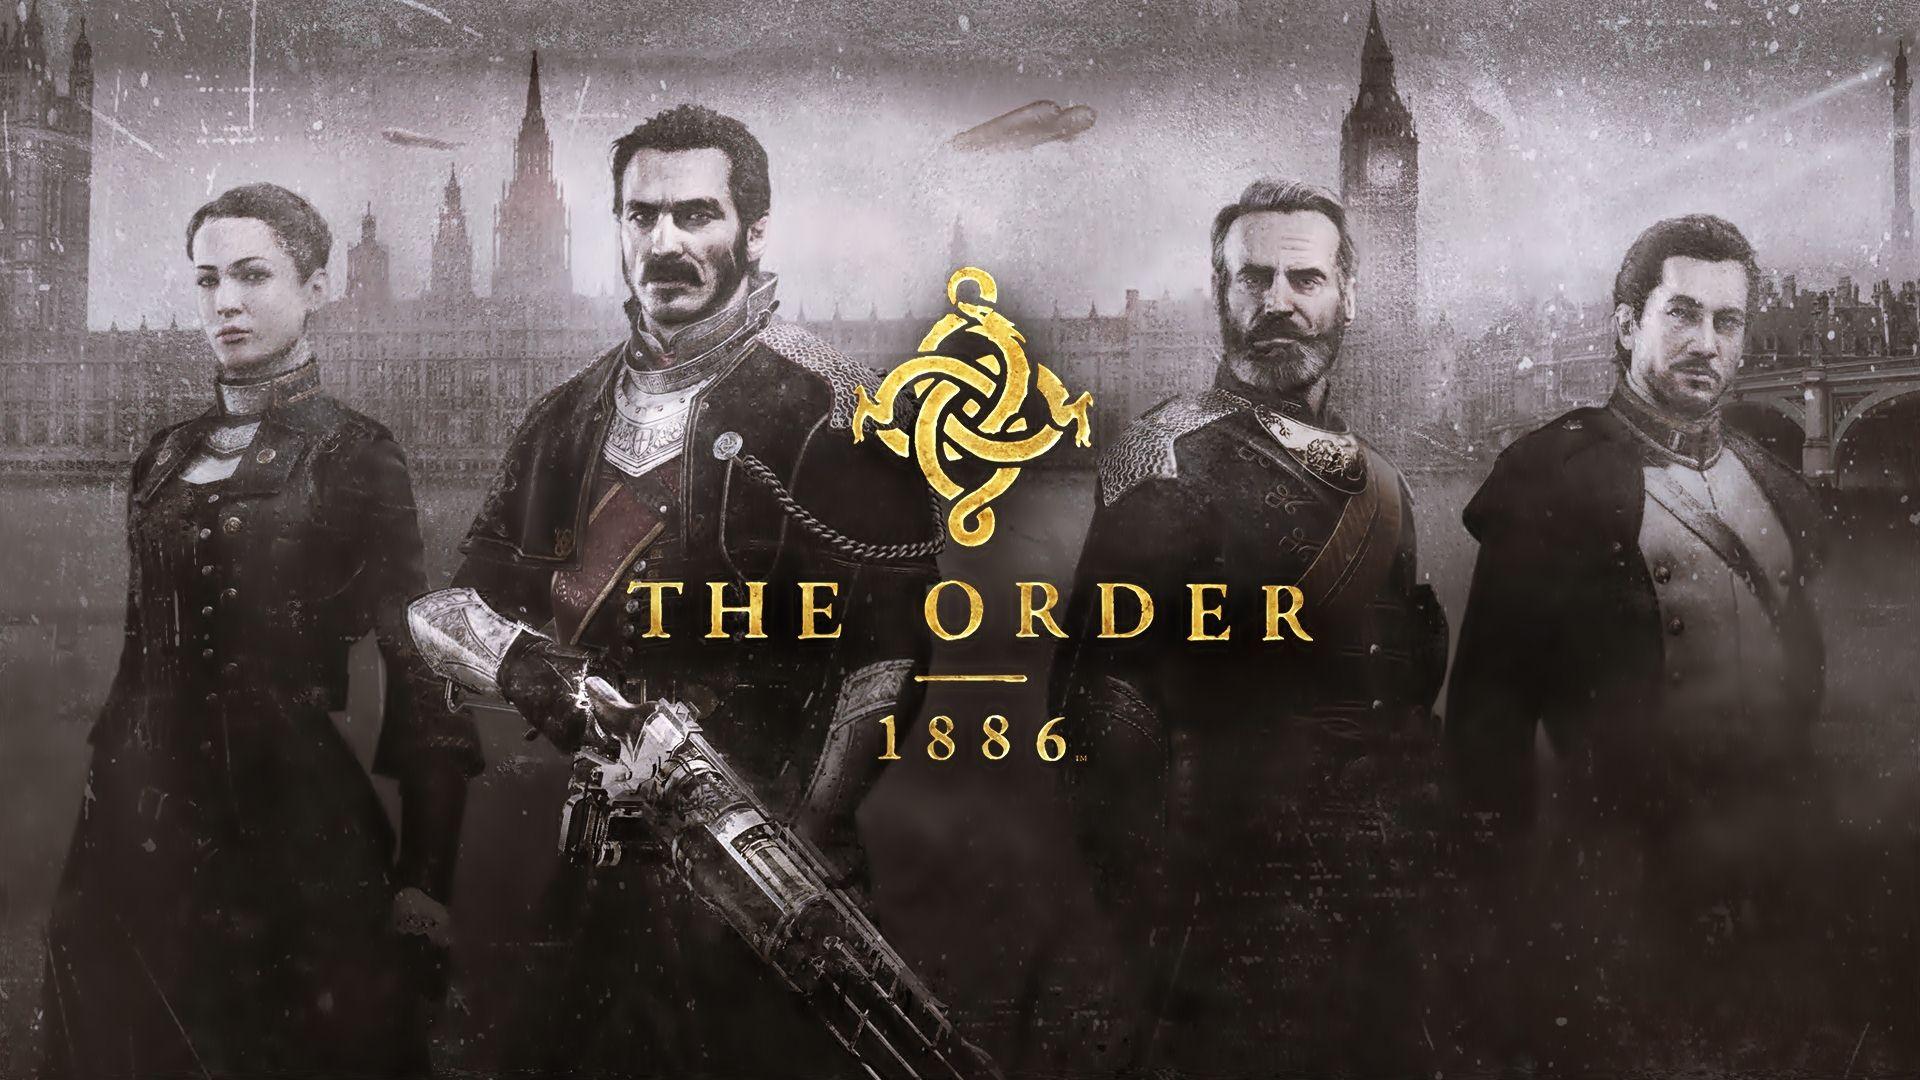 The Order 1886 Wallpaper